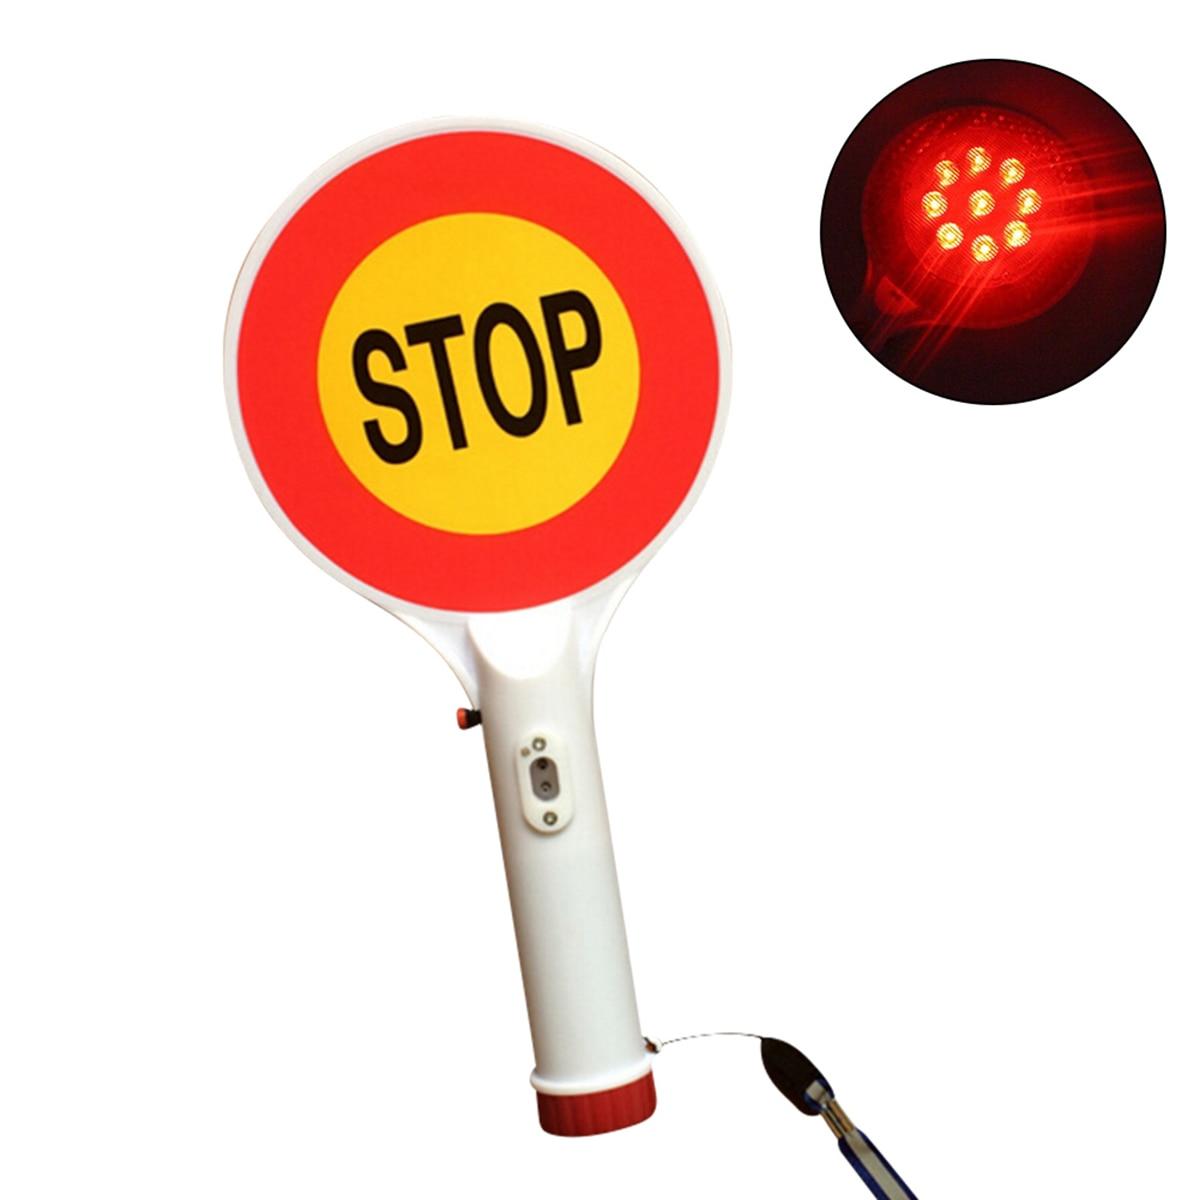 Señal de tráfico LED de mano Luz de parada señal de advertencia para coche recargable con linterna para control de tráfico construcción de carreteras bloqueadas